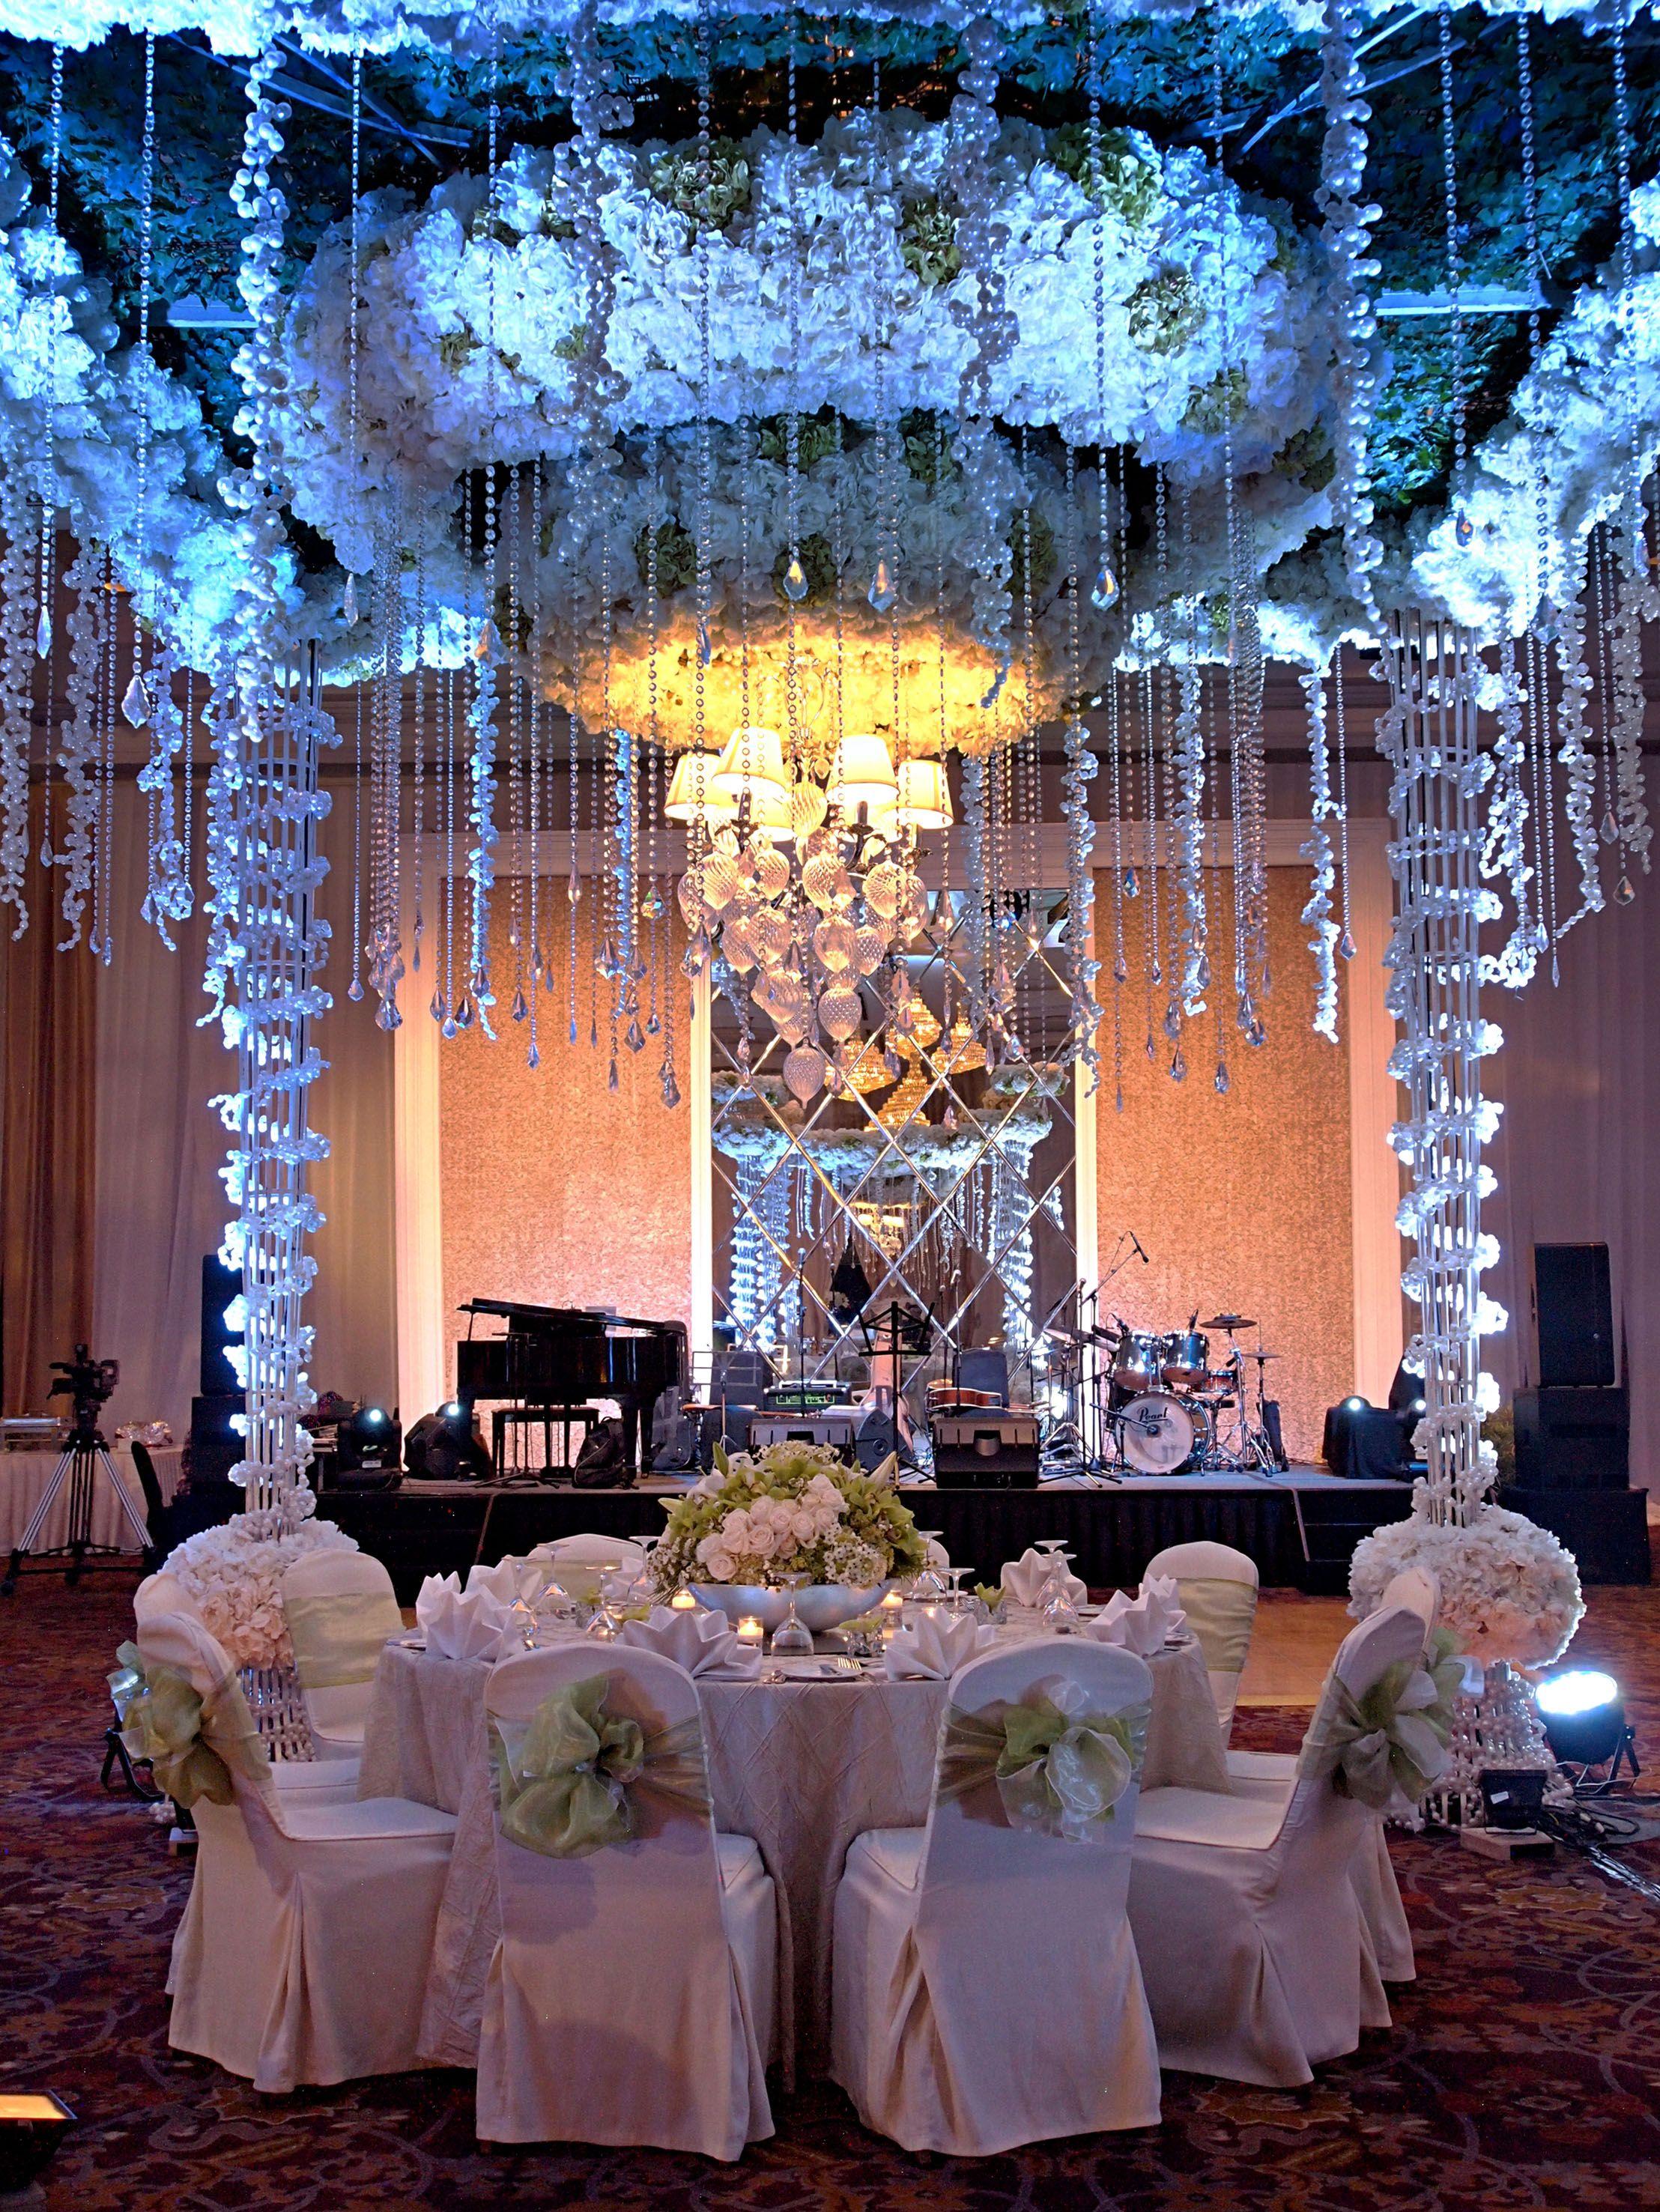 Ballroom Wedding Modern At Gran Melia Jakarta Jakarta Indonesia Ballroom Wedding Wedding Modern Hotel